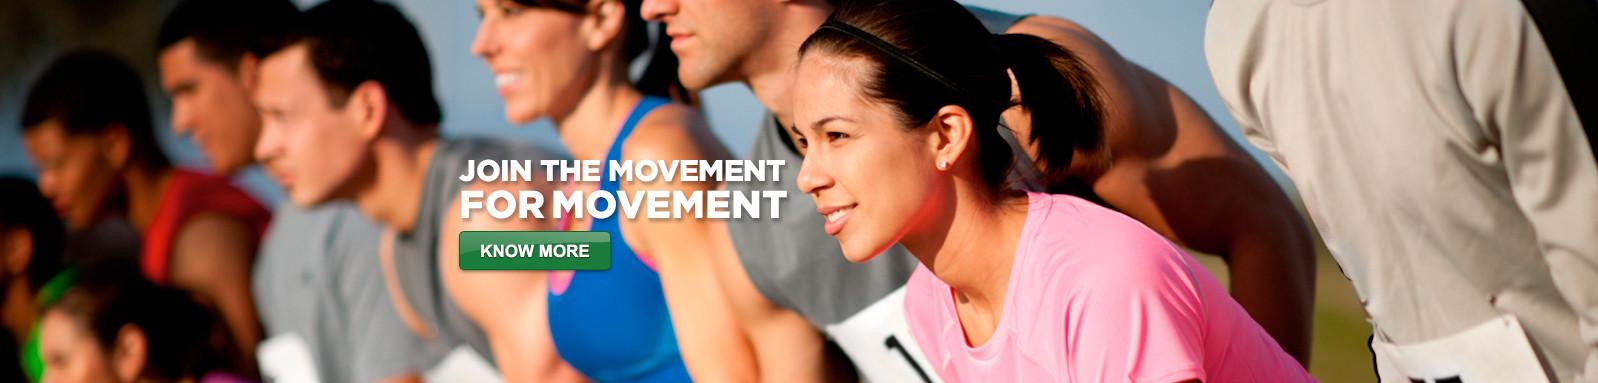 Join the moment for moment - Stepathlon